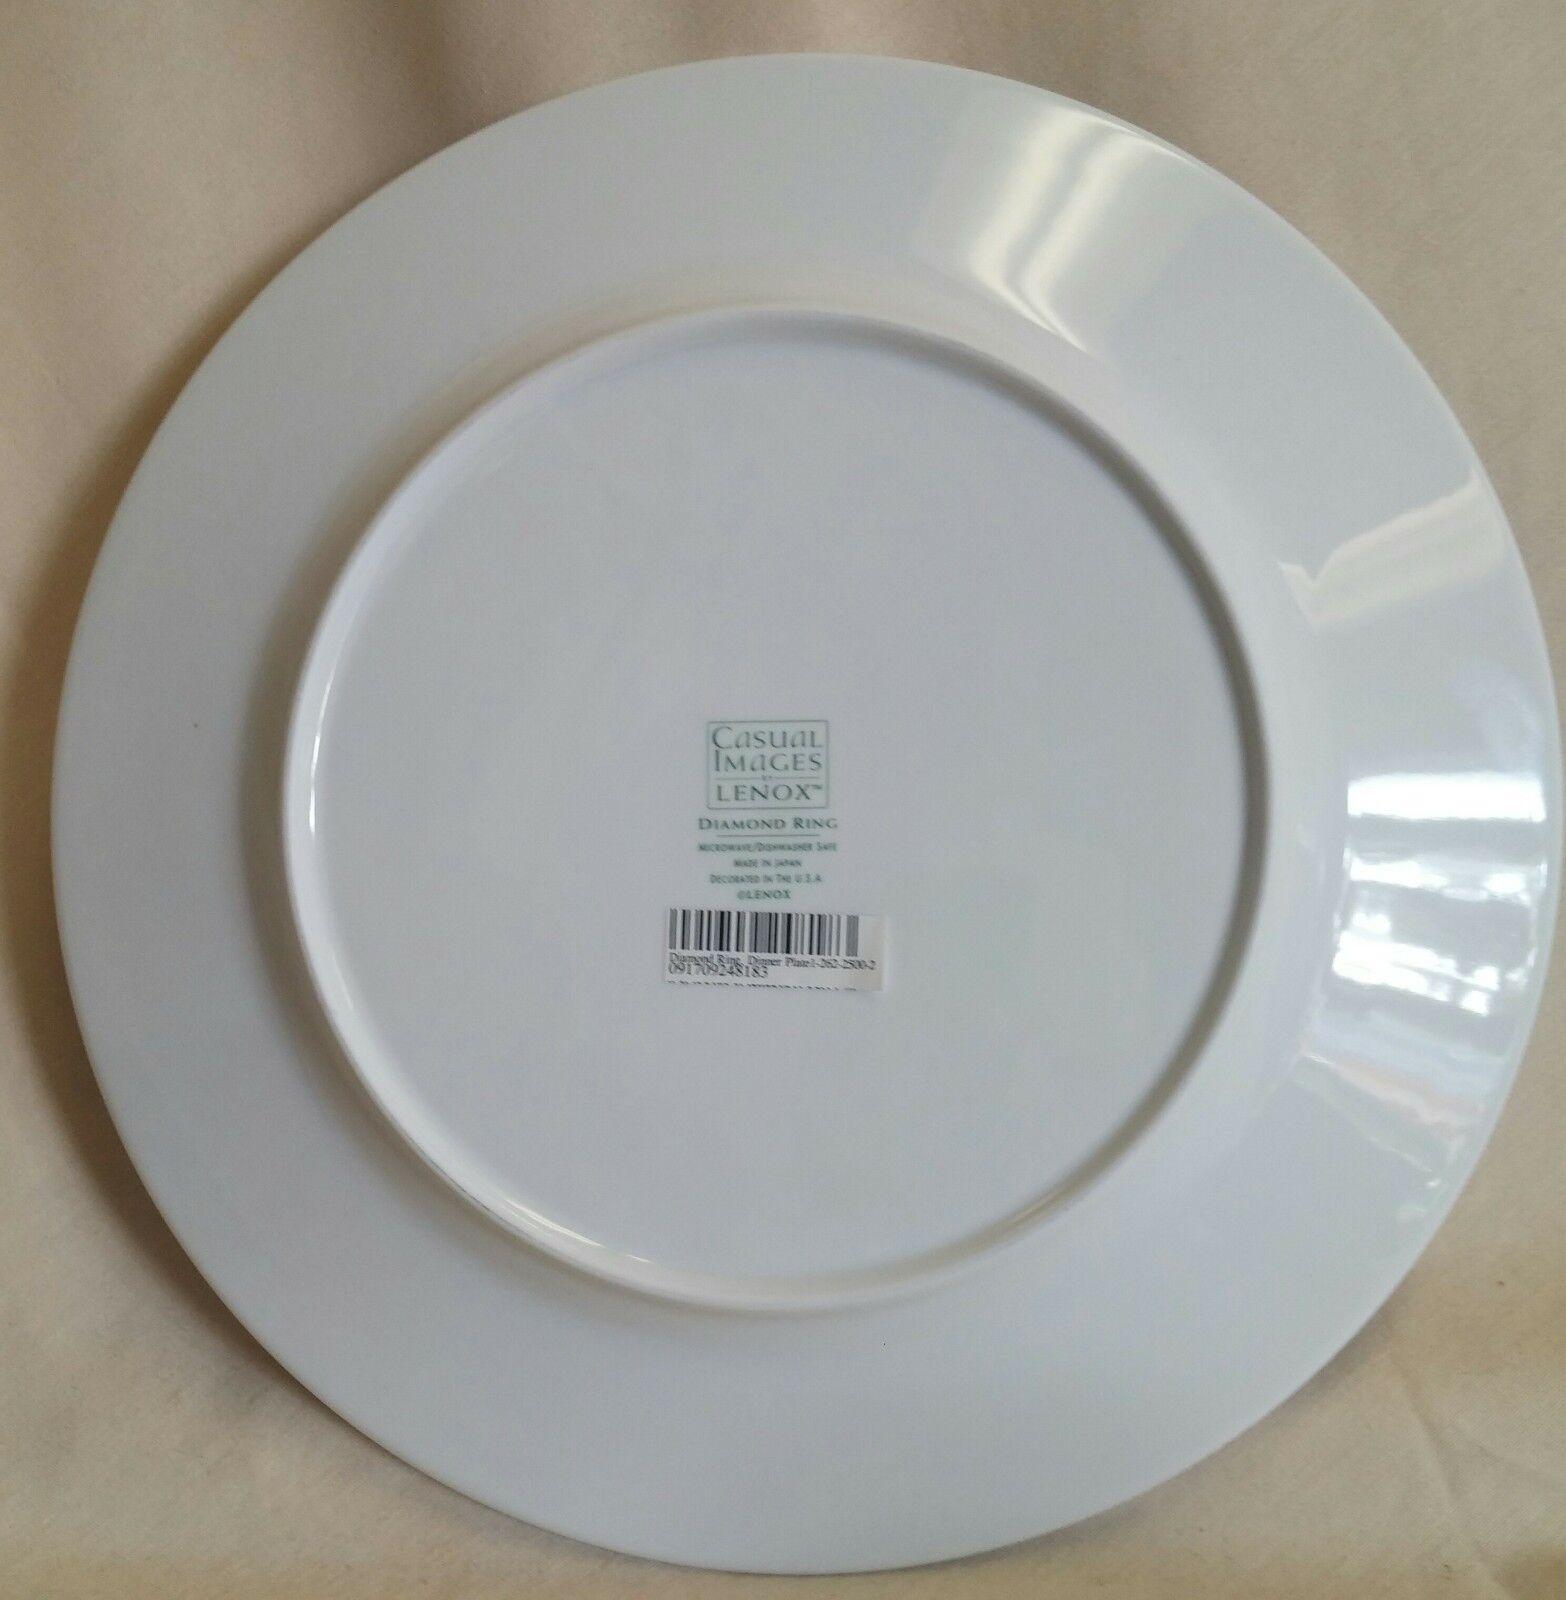 LENOX DIAMOND RING Dinner, Salad, Cereal Mug  - $79.00